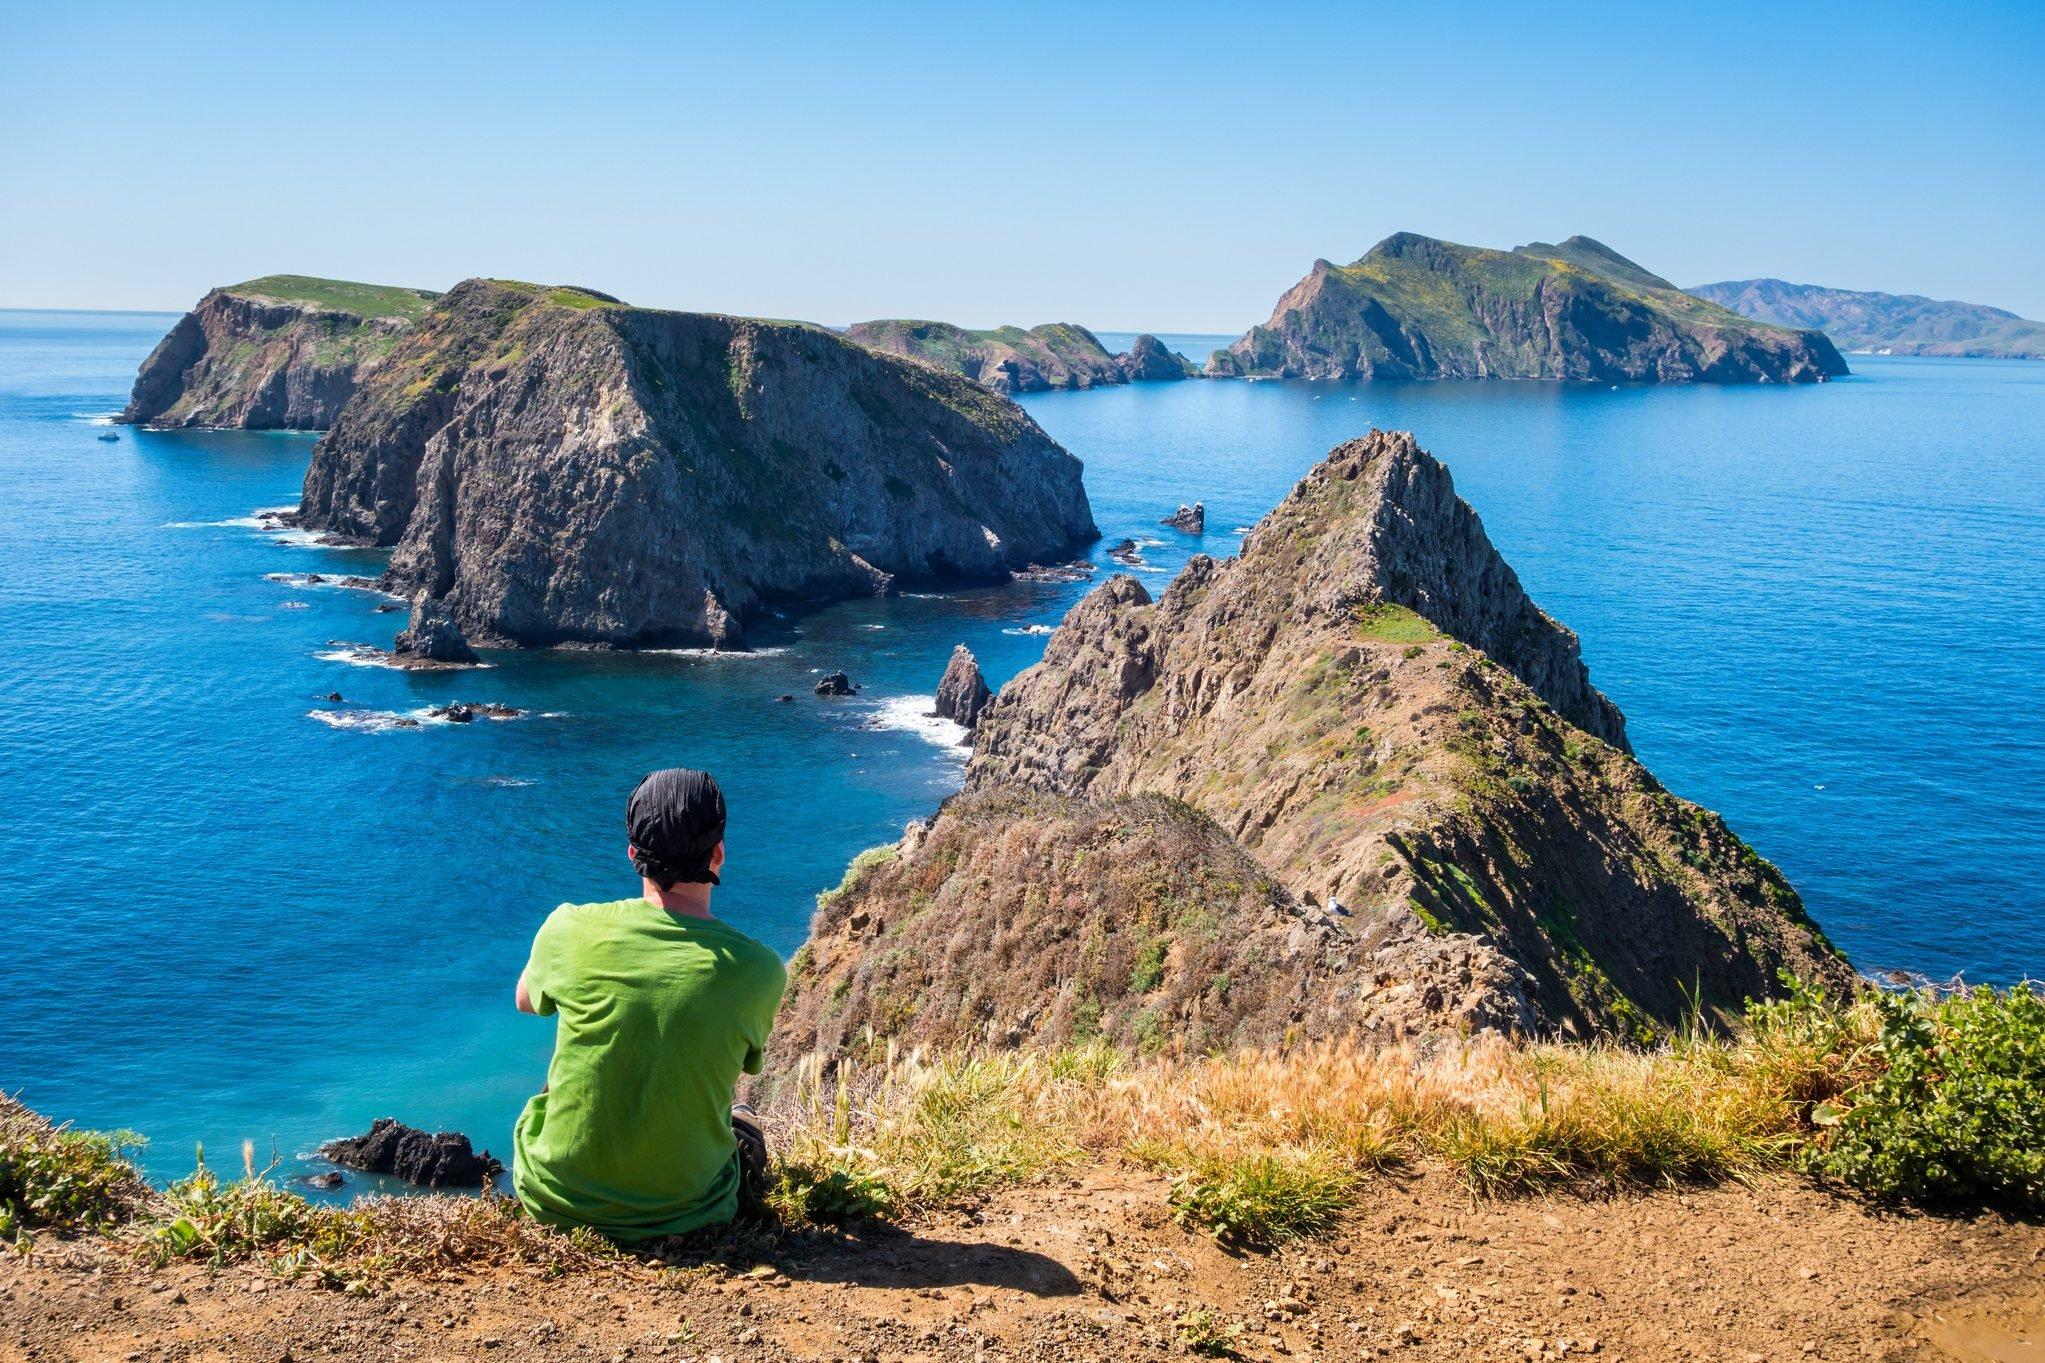 Adventure Traveller Breathtaking Islands Channel Islands National Park Los Angeles